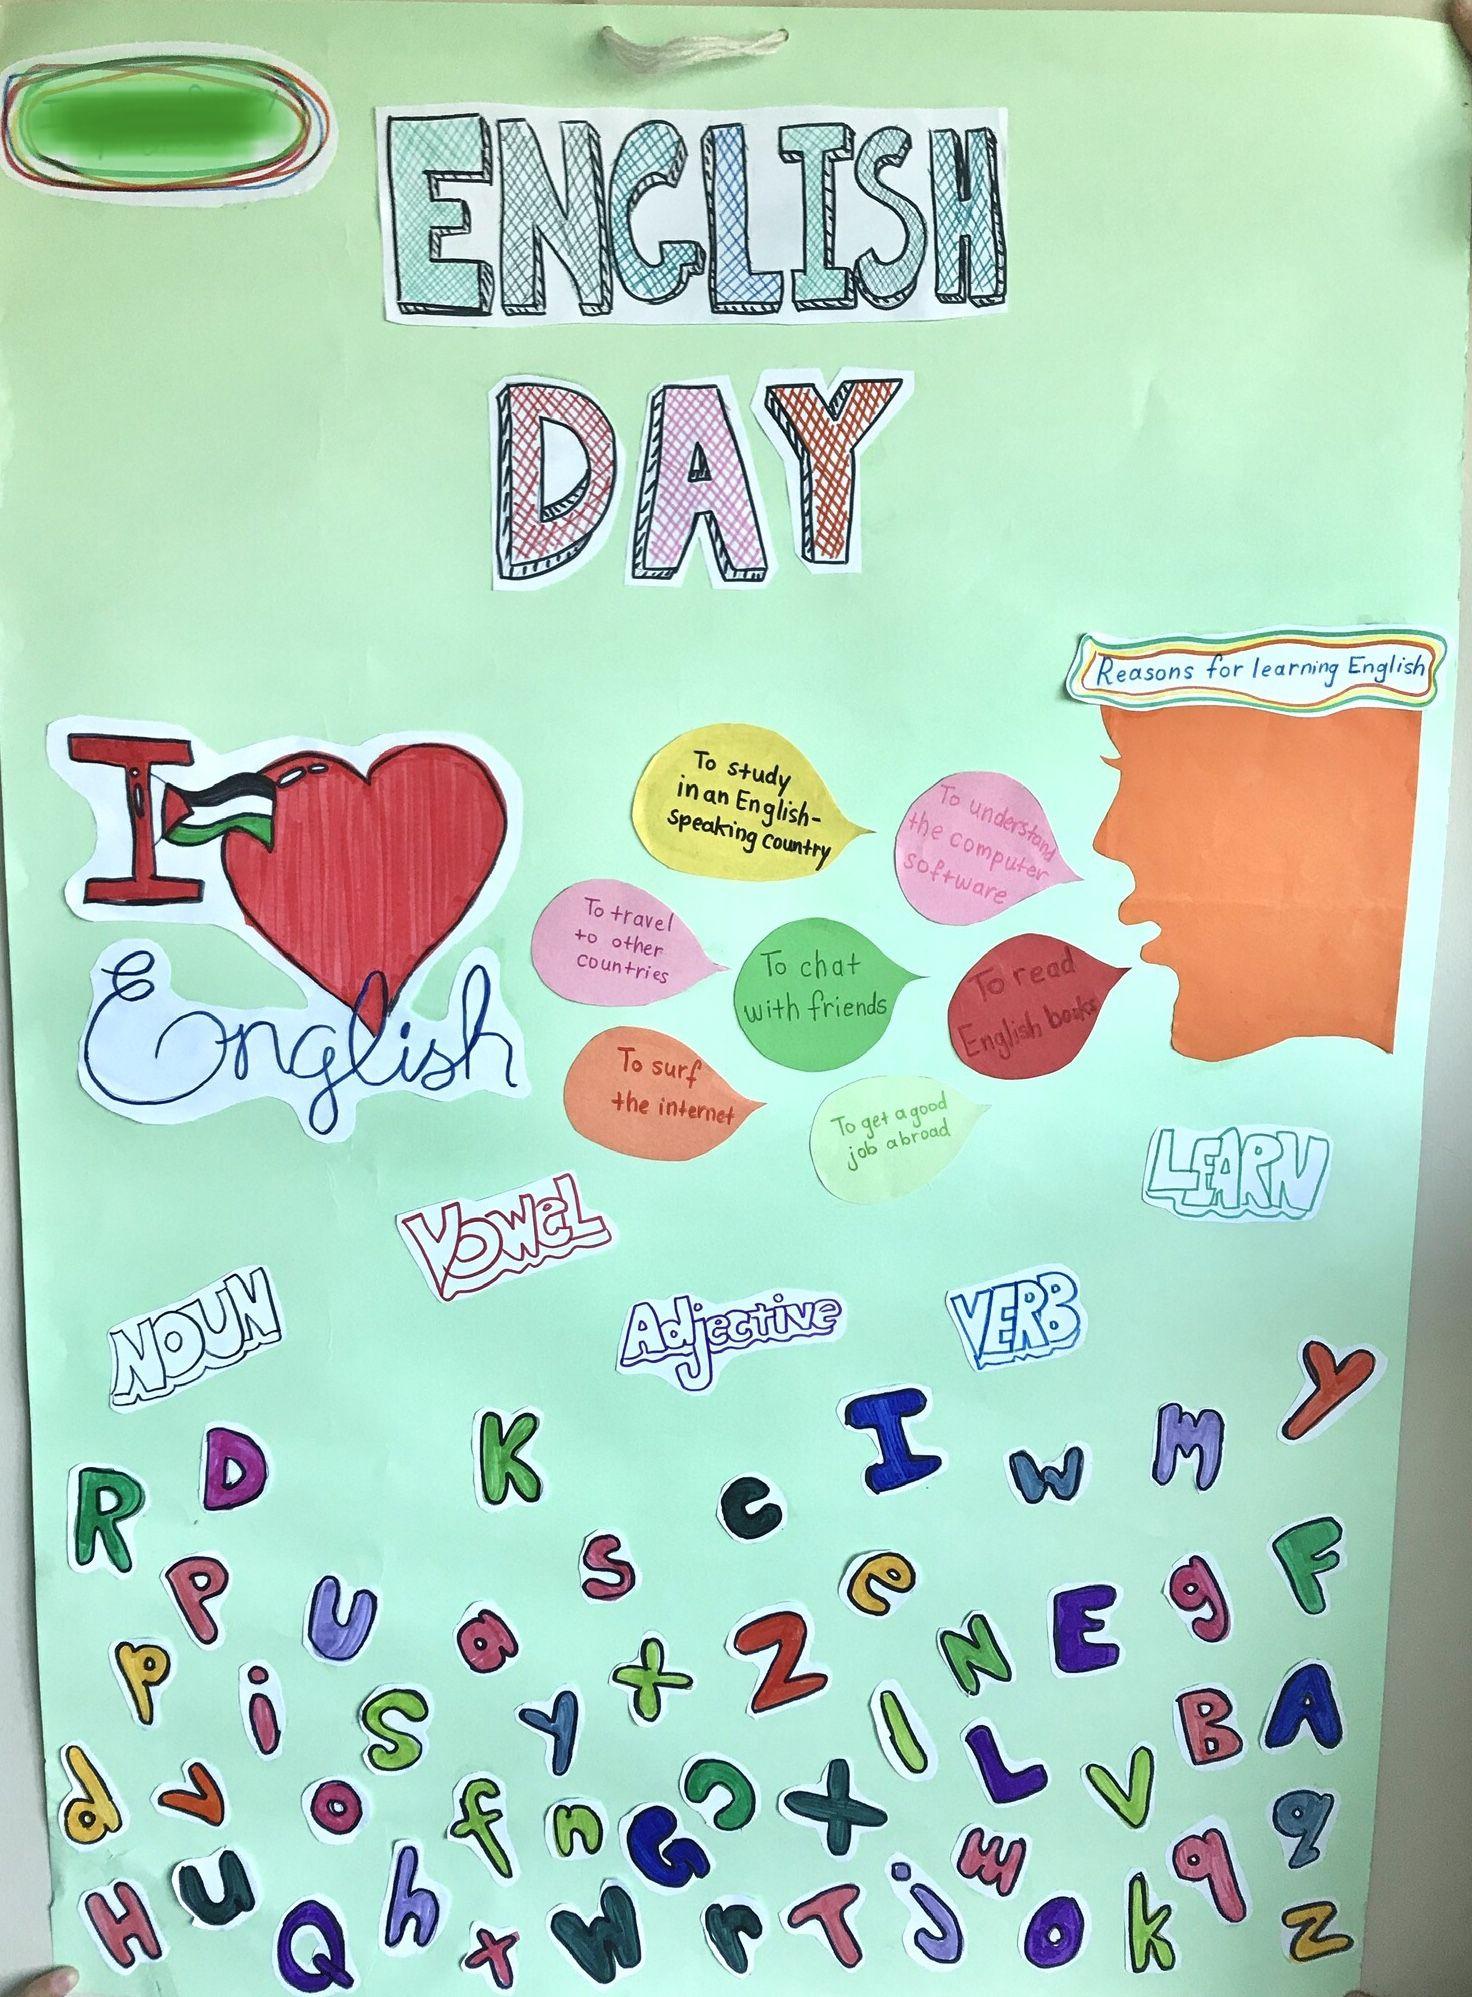 School Project For Kids About English Language Day مشروع للاطفال لوحة عن يوم الإنجليزي العالمي Day Study